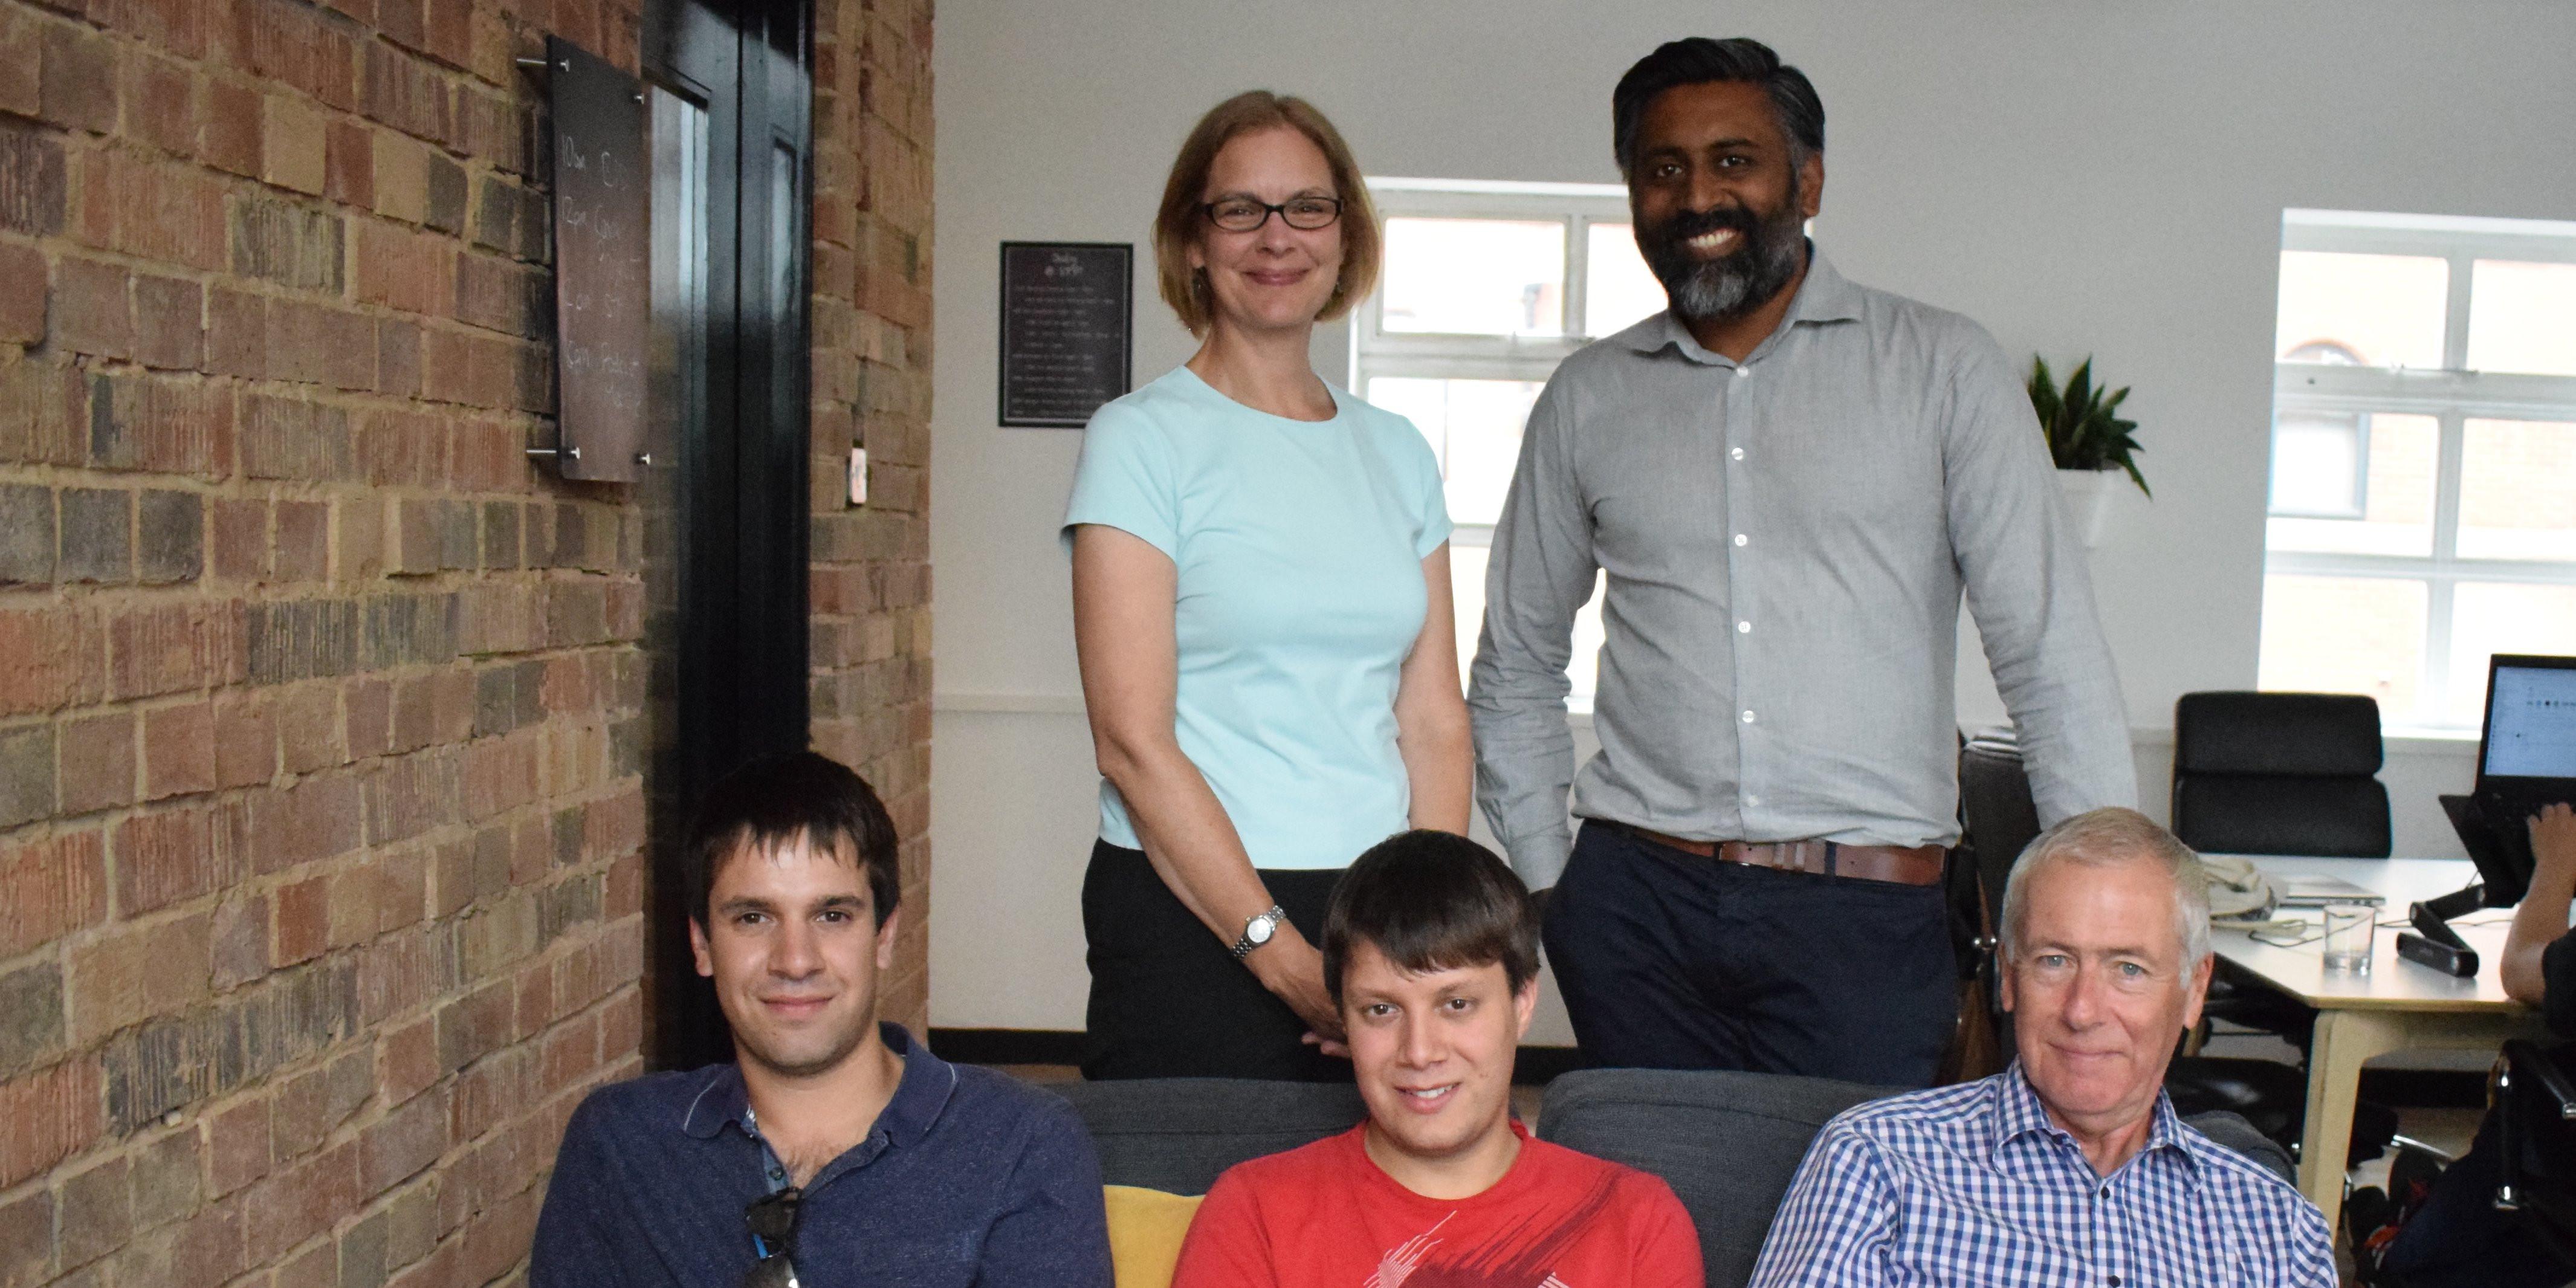 Six business leaders join the STP team as Entrepreneurs in Residence